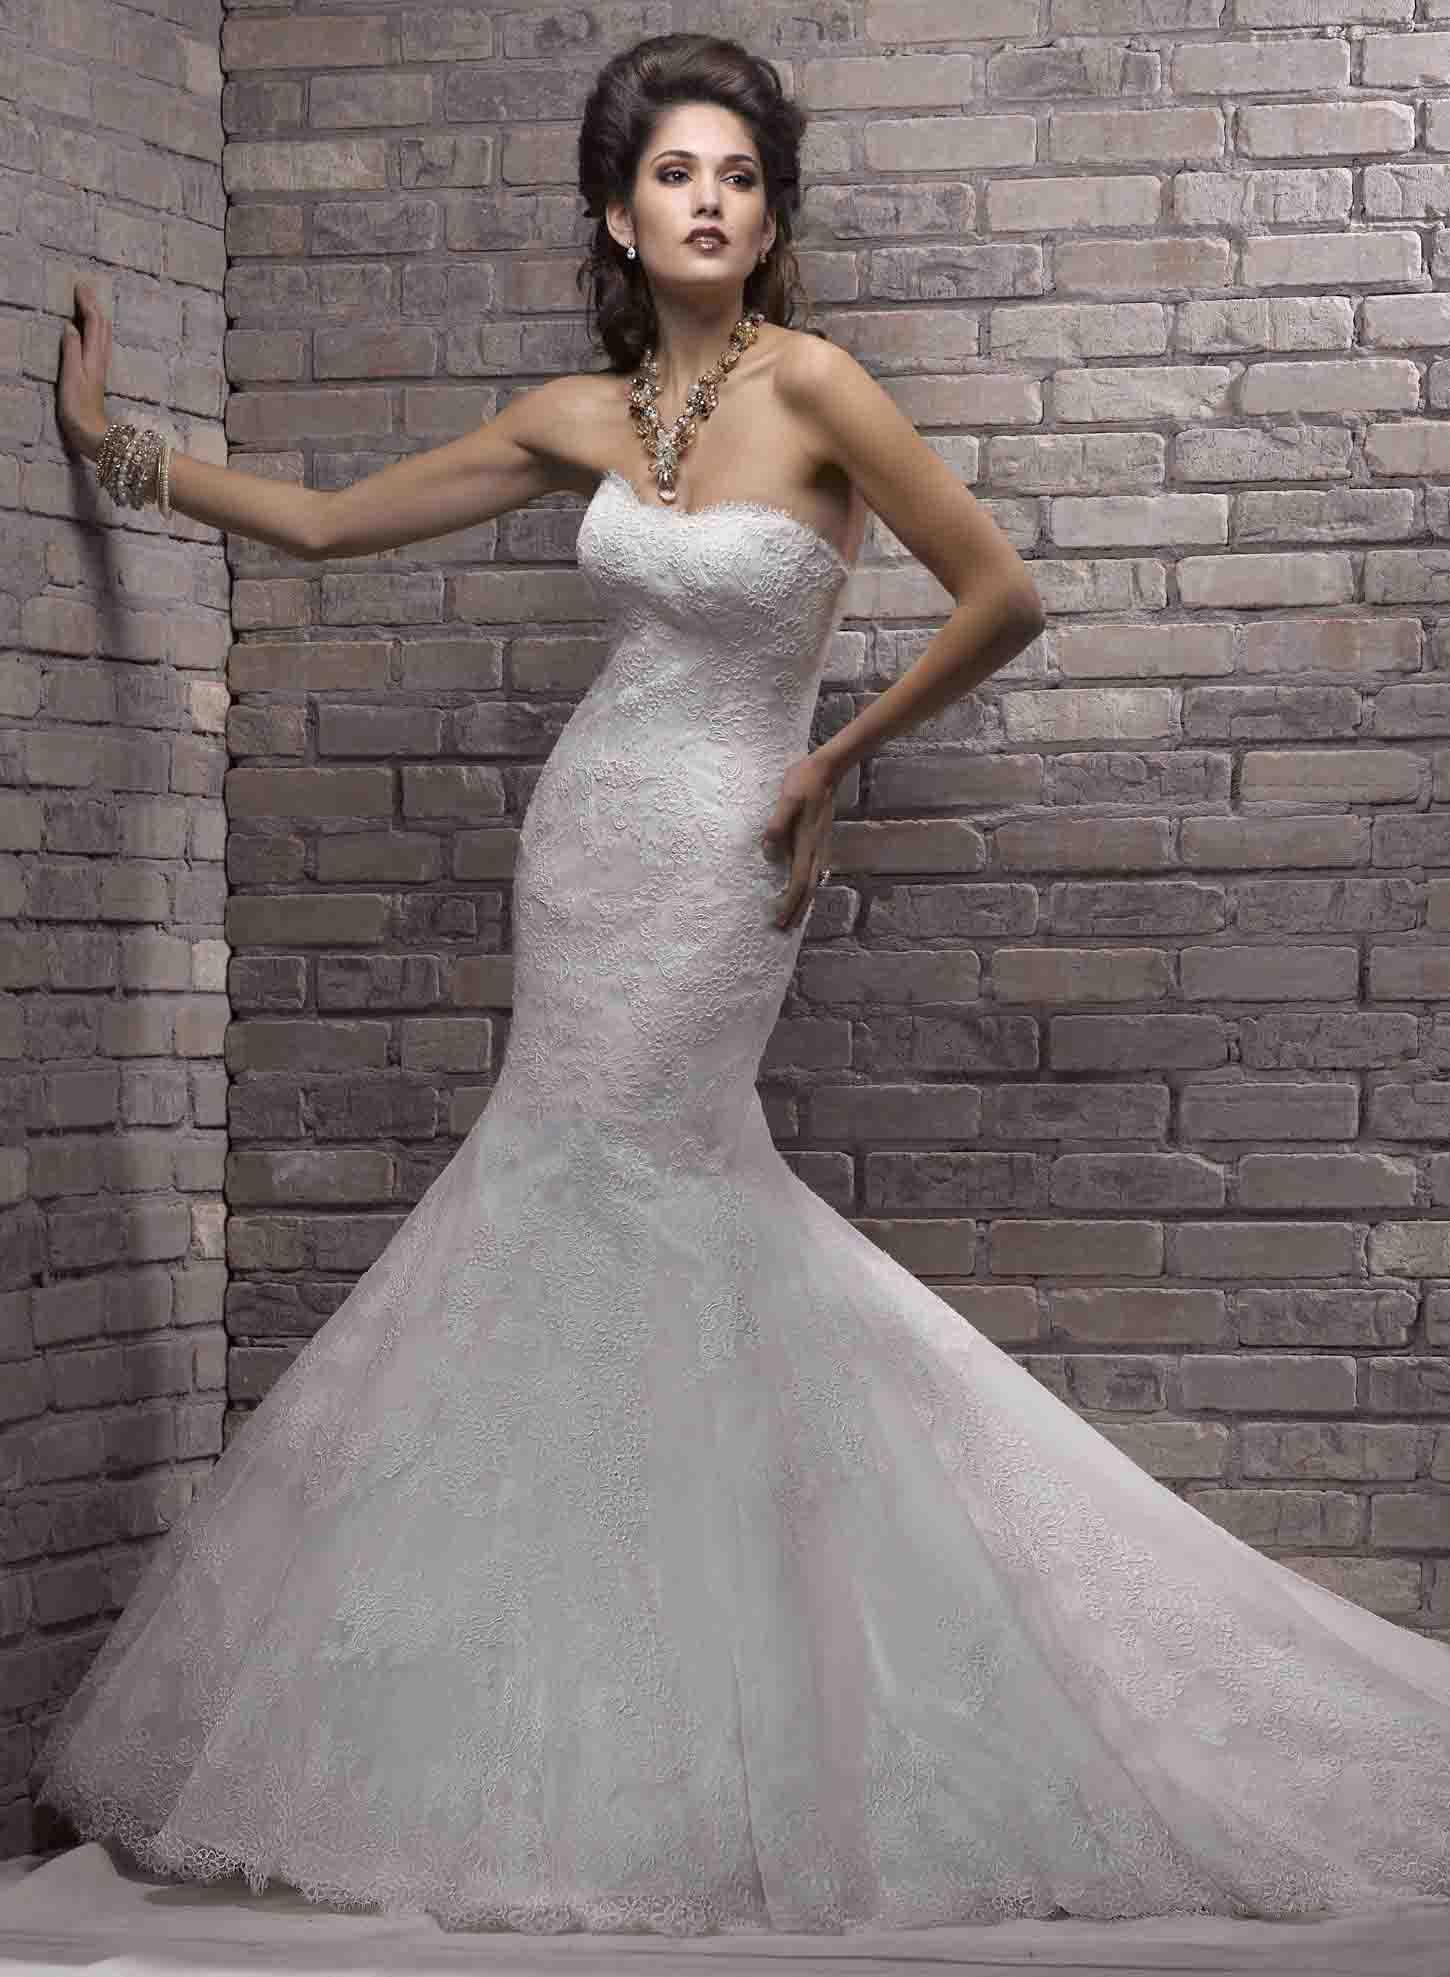 Amazing Mermaid Wedding Dresses 2013 (29)